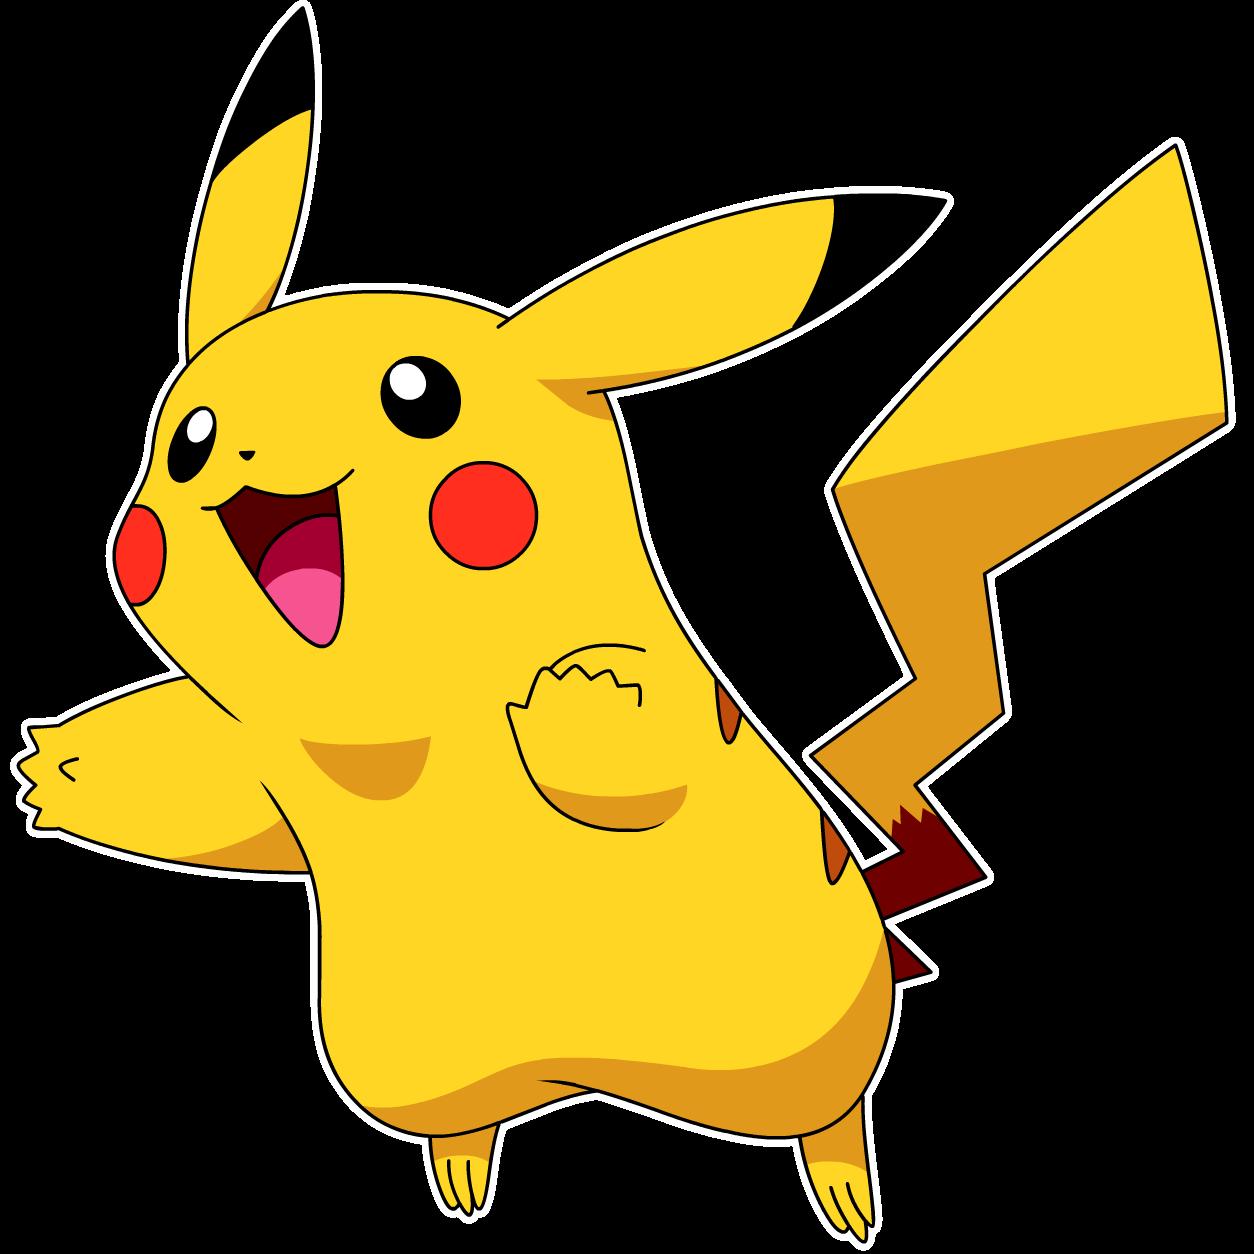 Cartoon Characters: Pokemon season 1 main characters